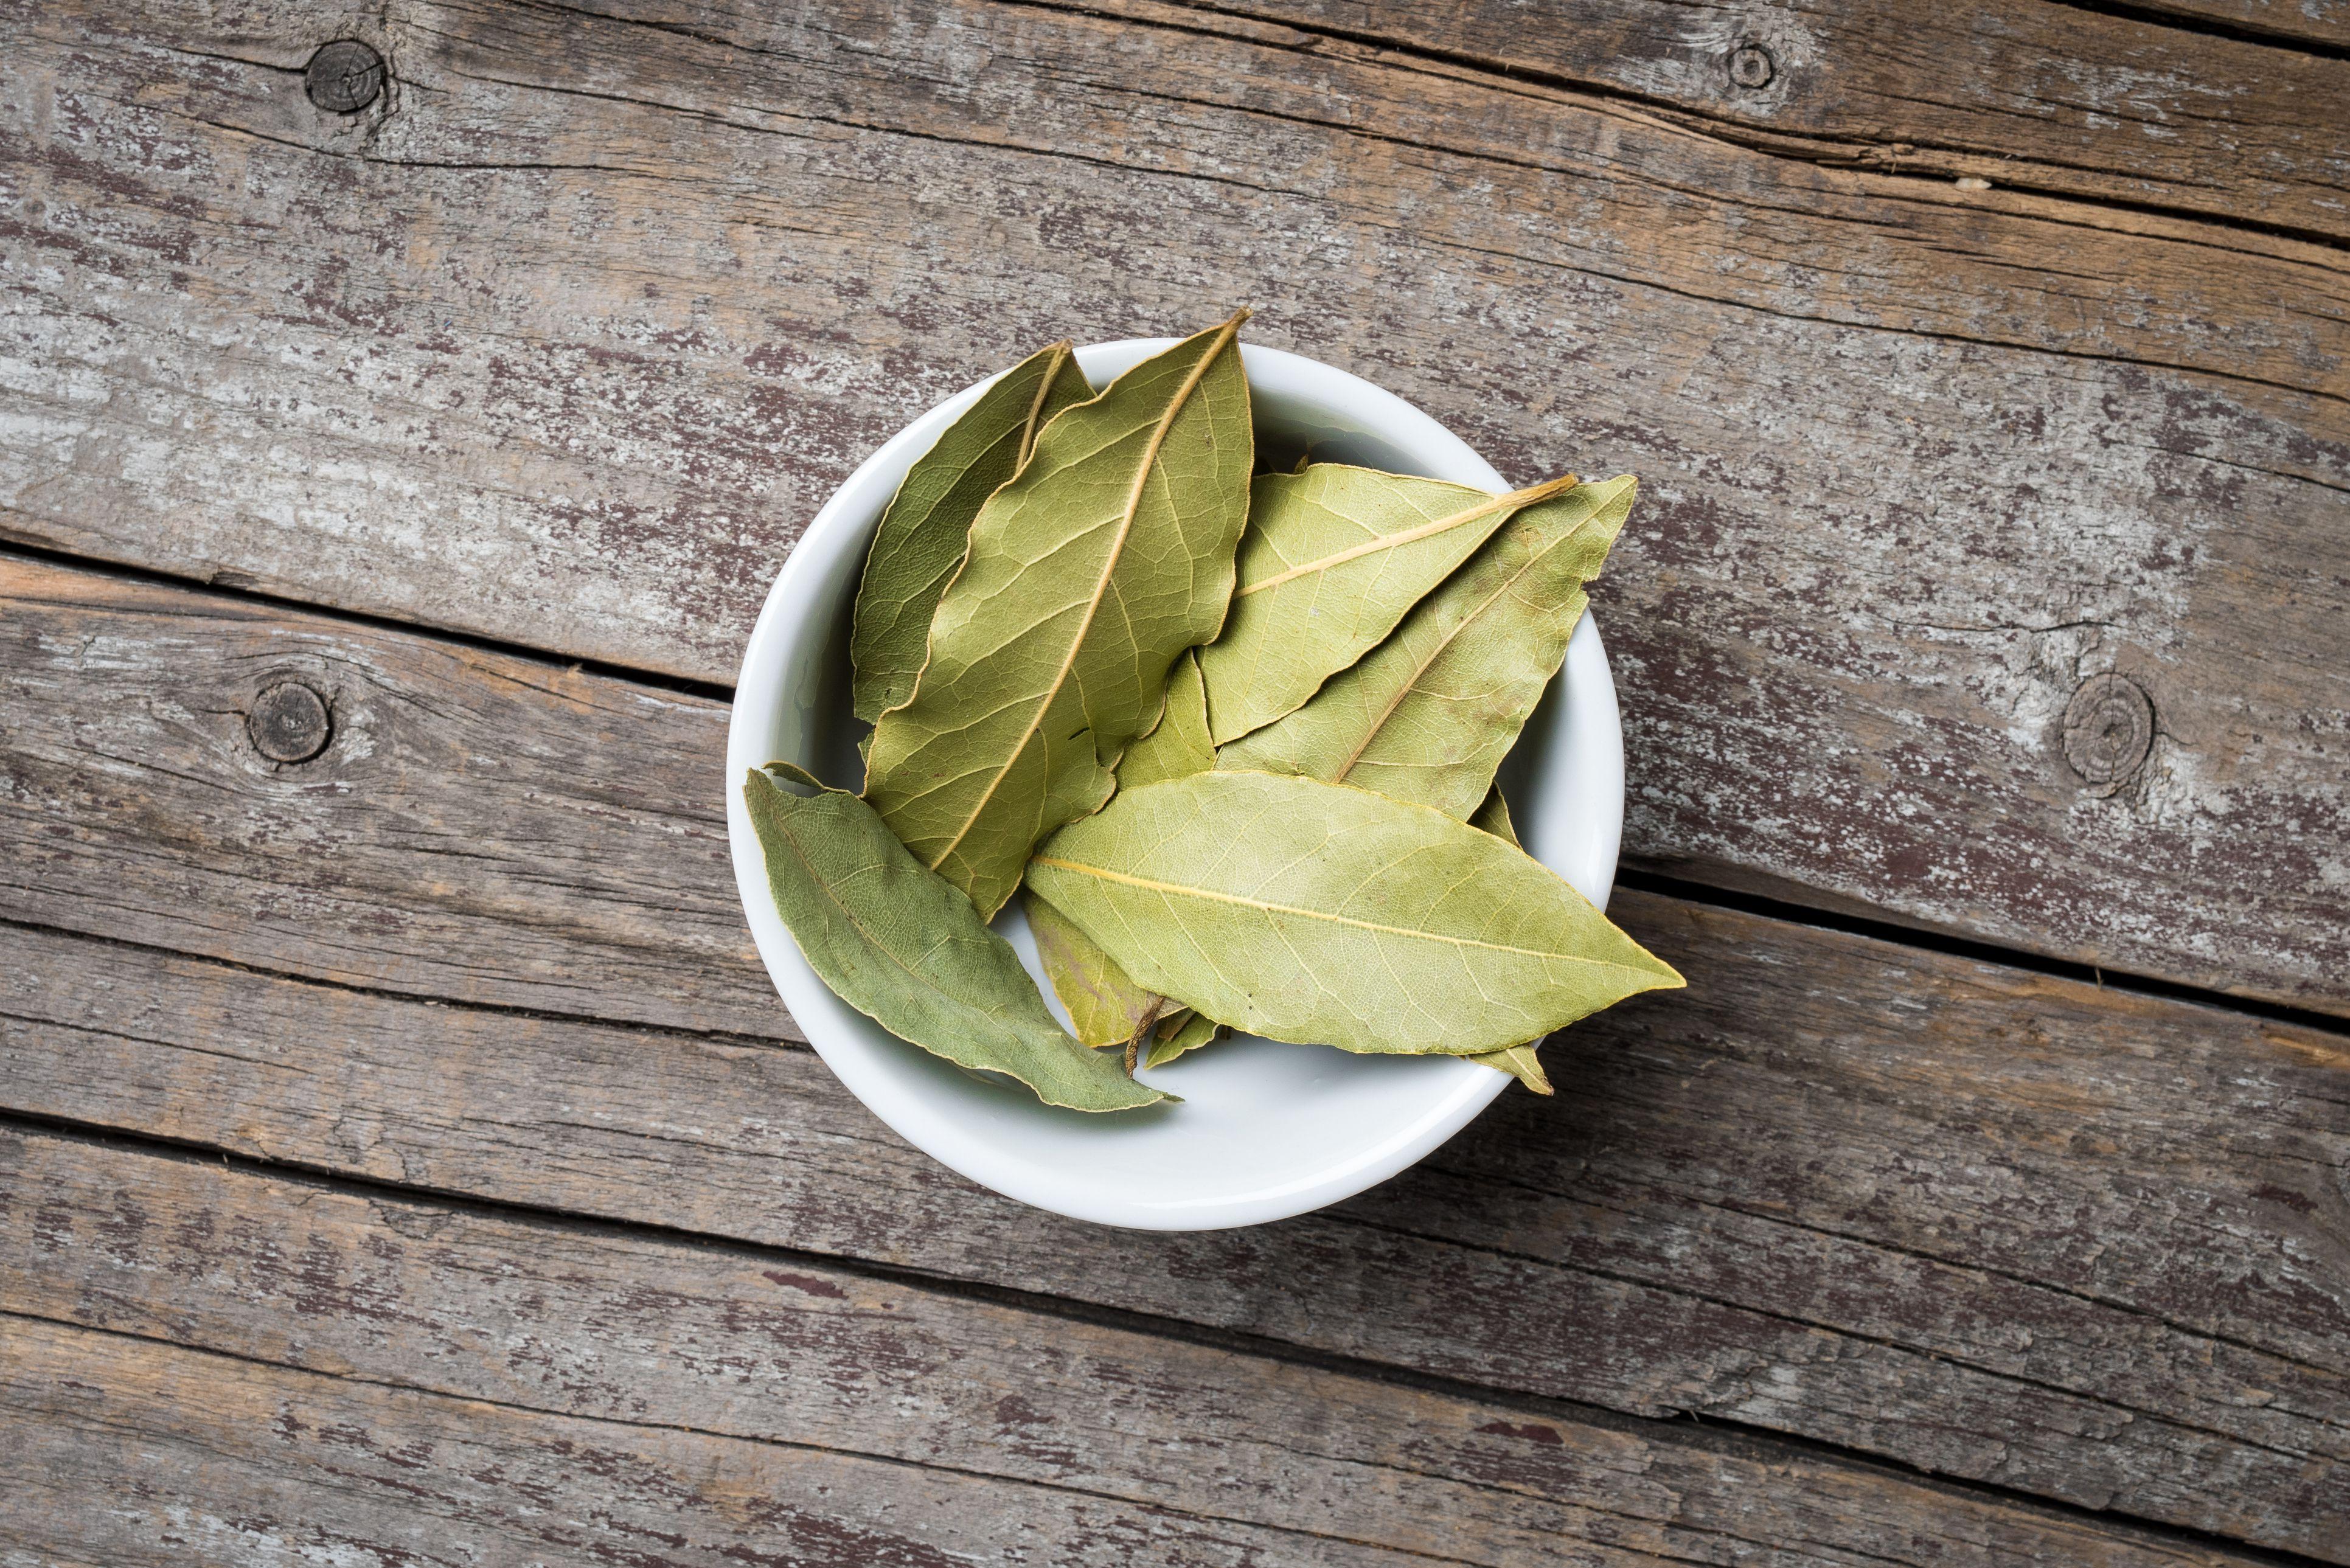 Bay leaves in white bowl